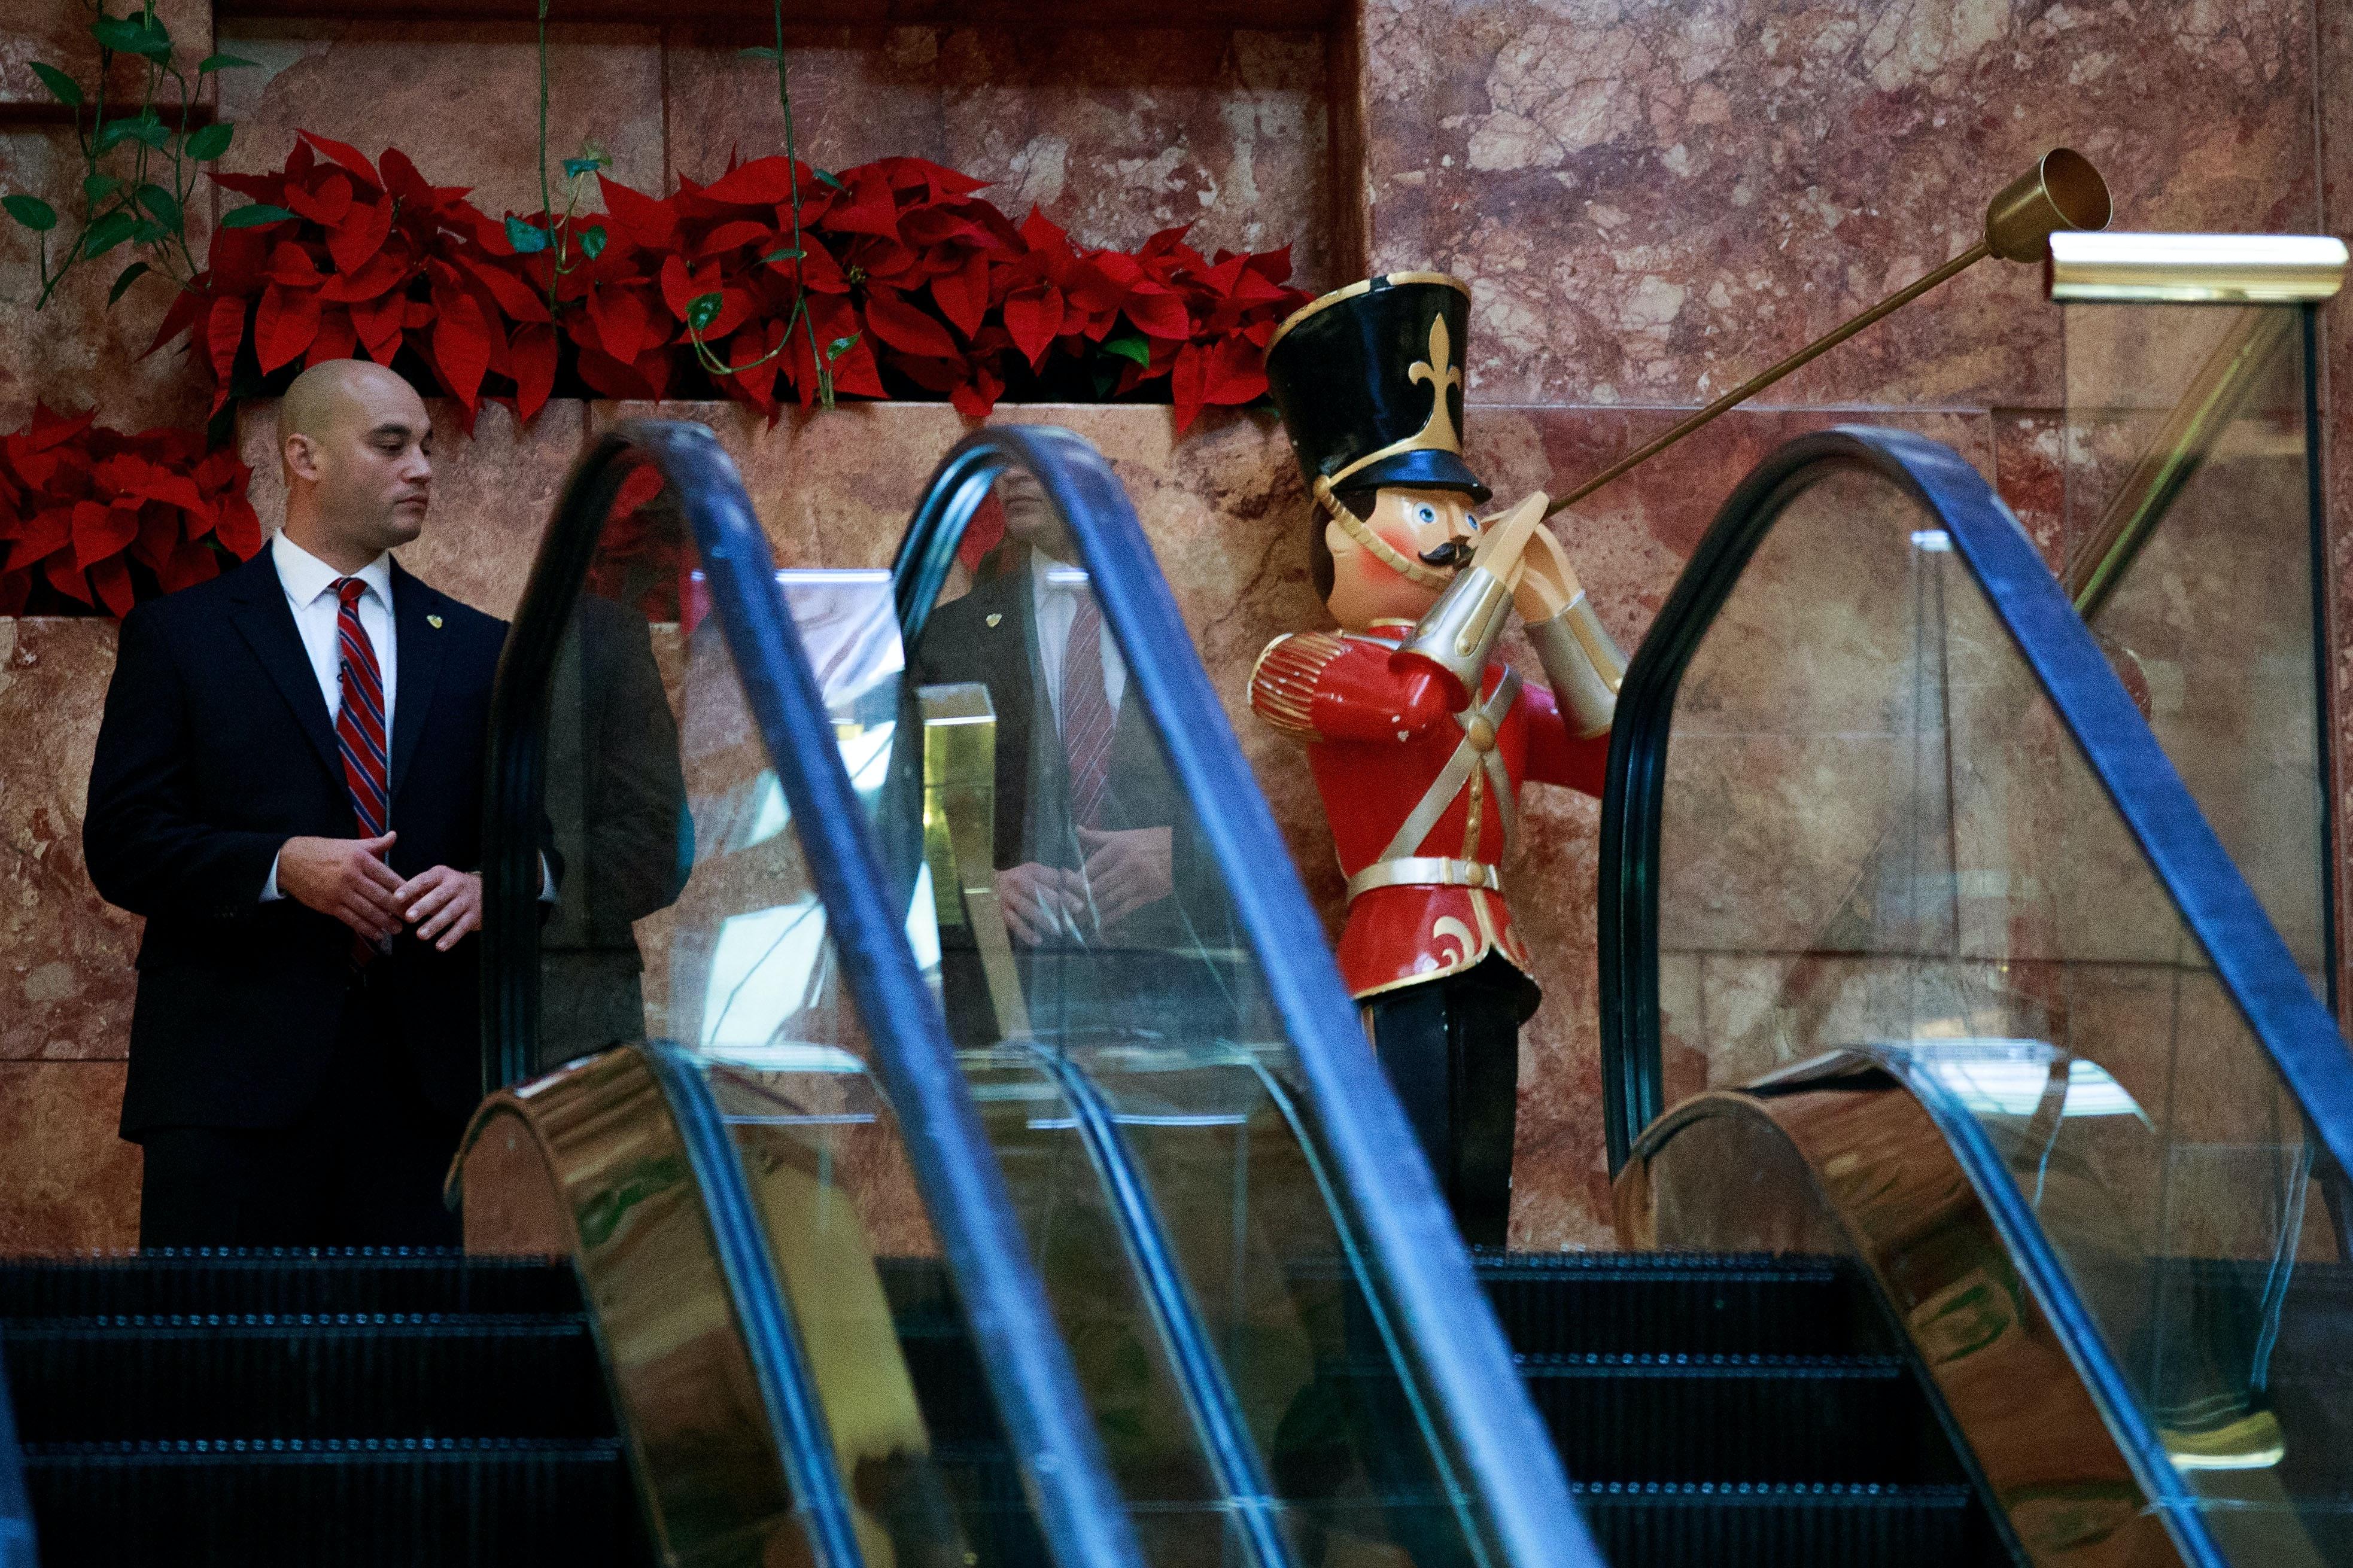 Realtor Uses Secret Service to Sell Trump Tower Condo